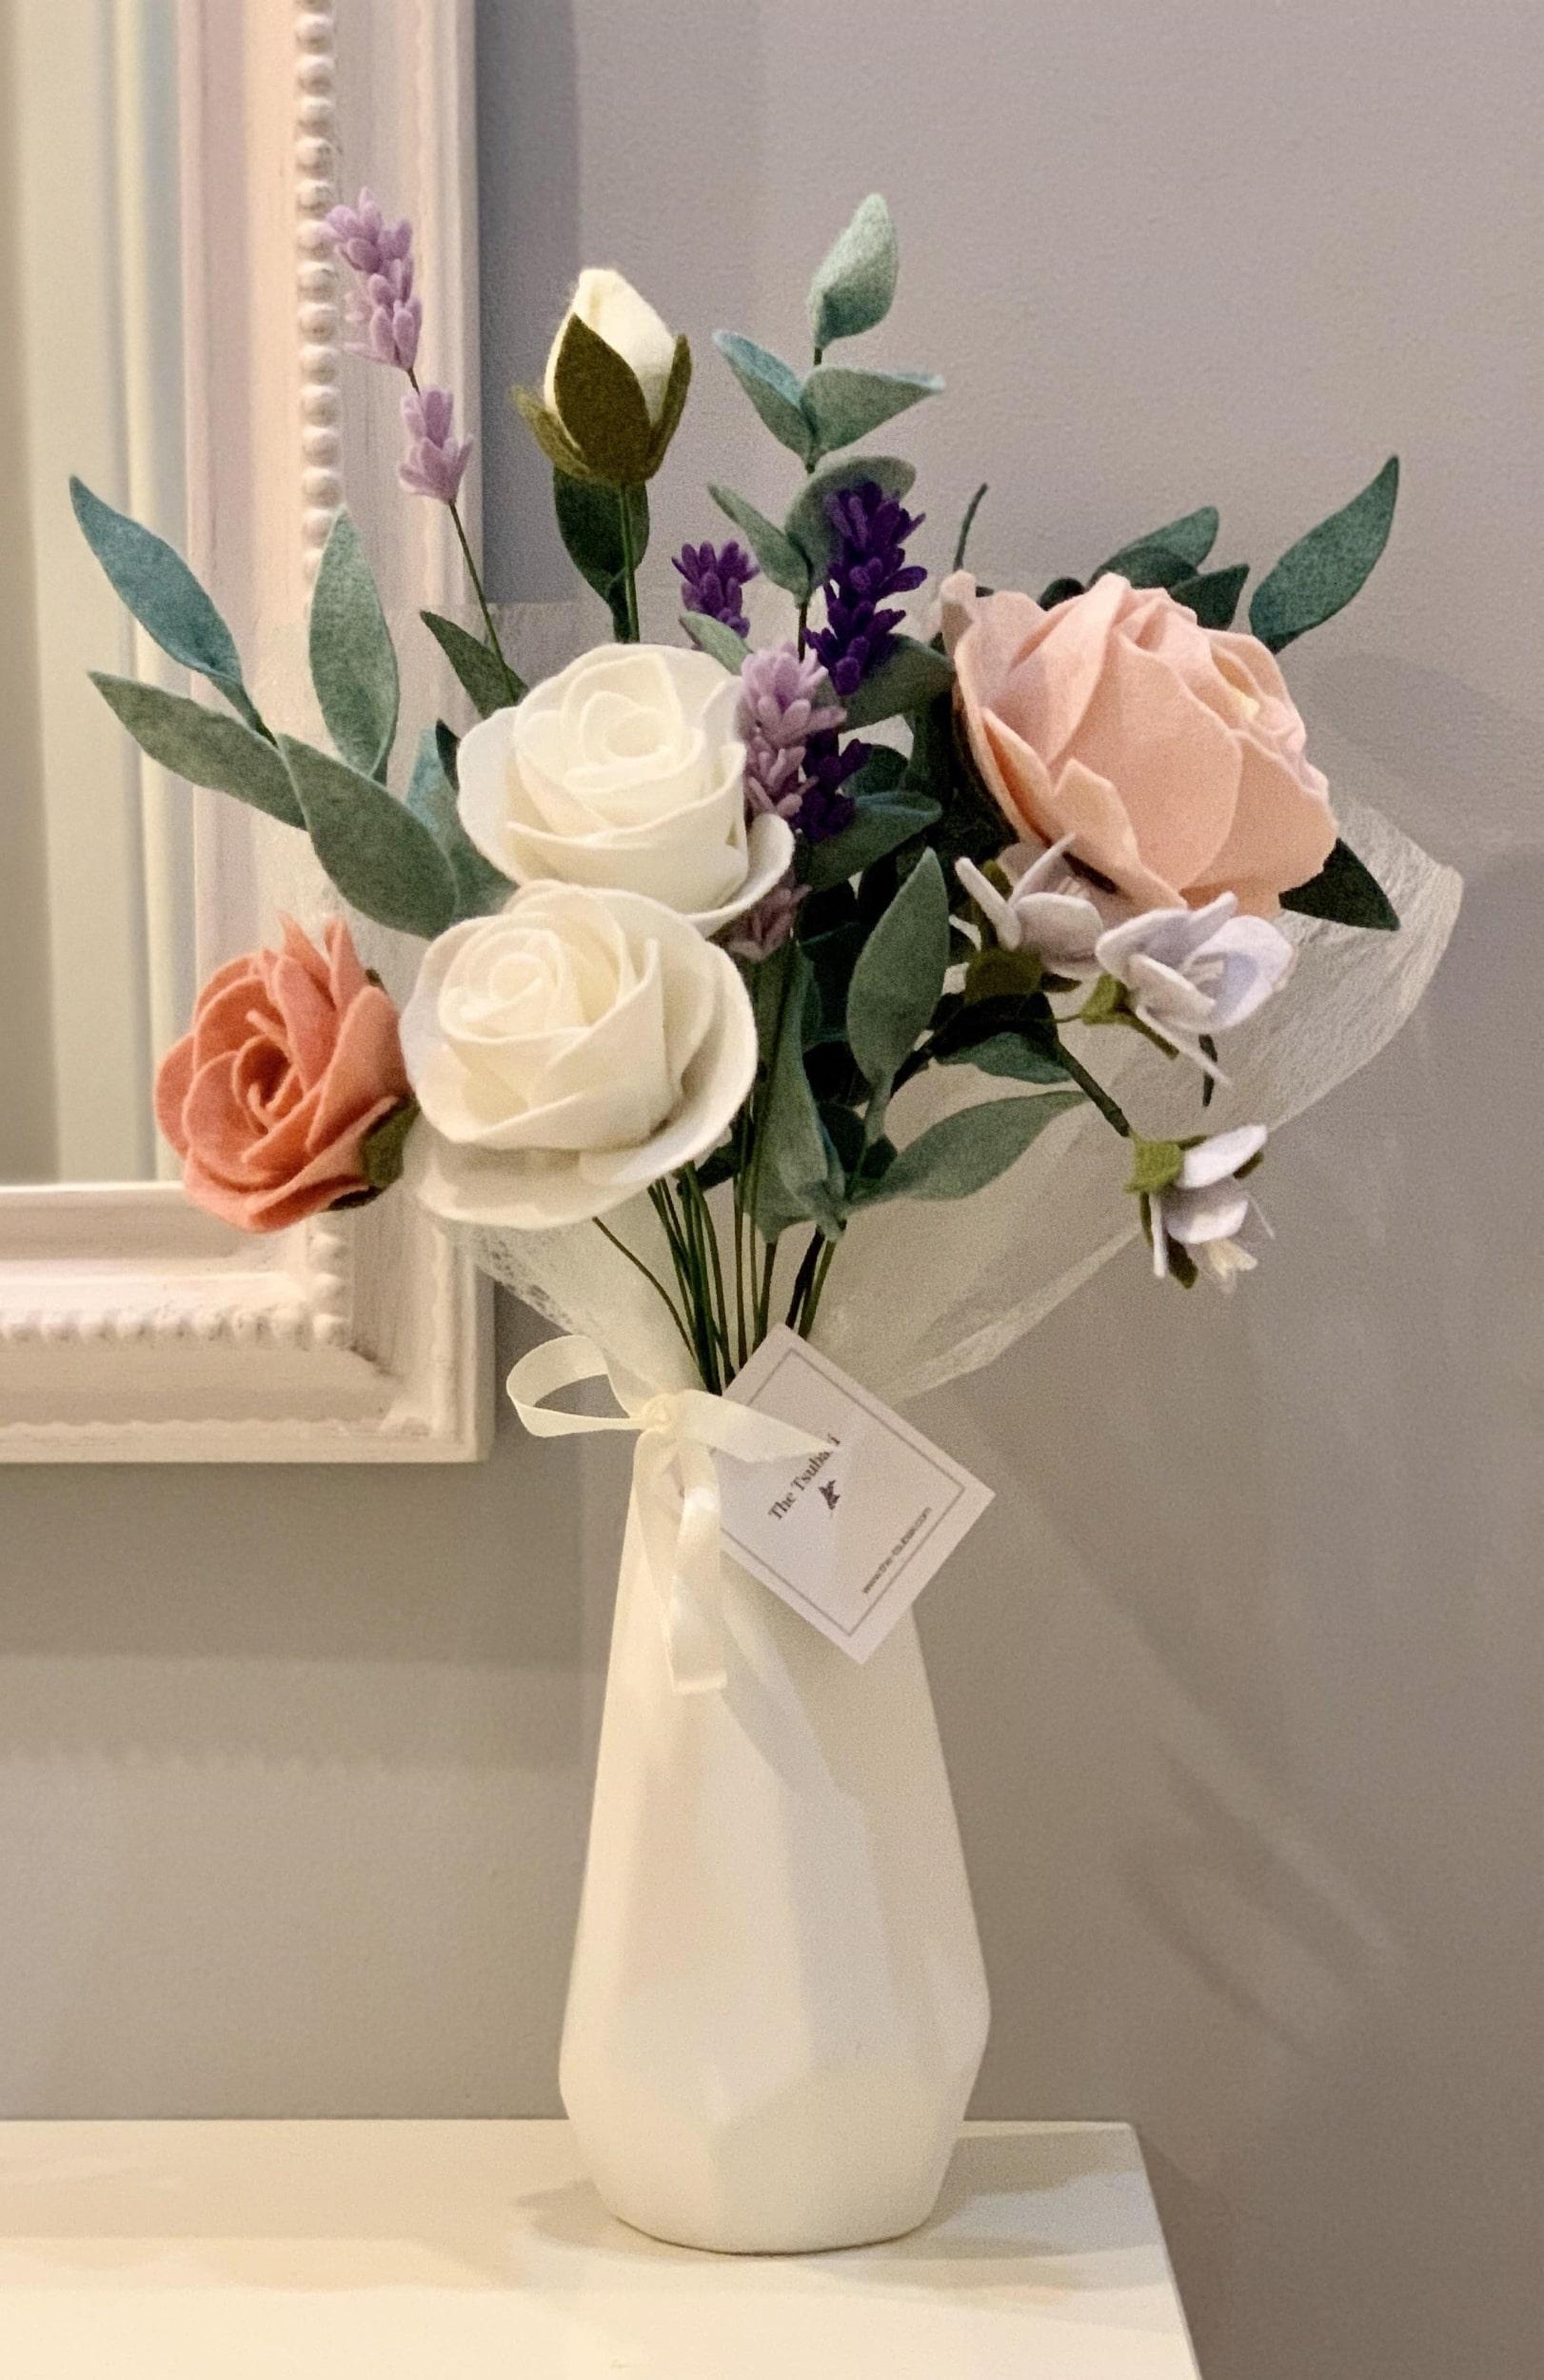 The Tsubaki Flowers